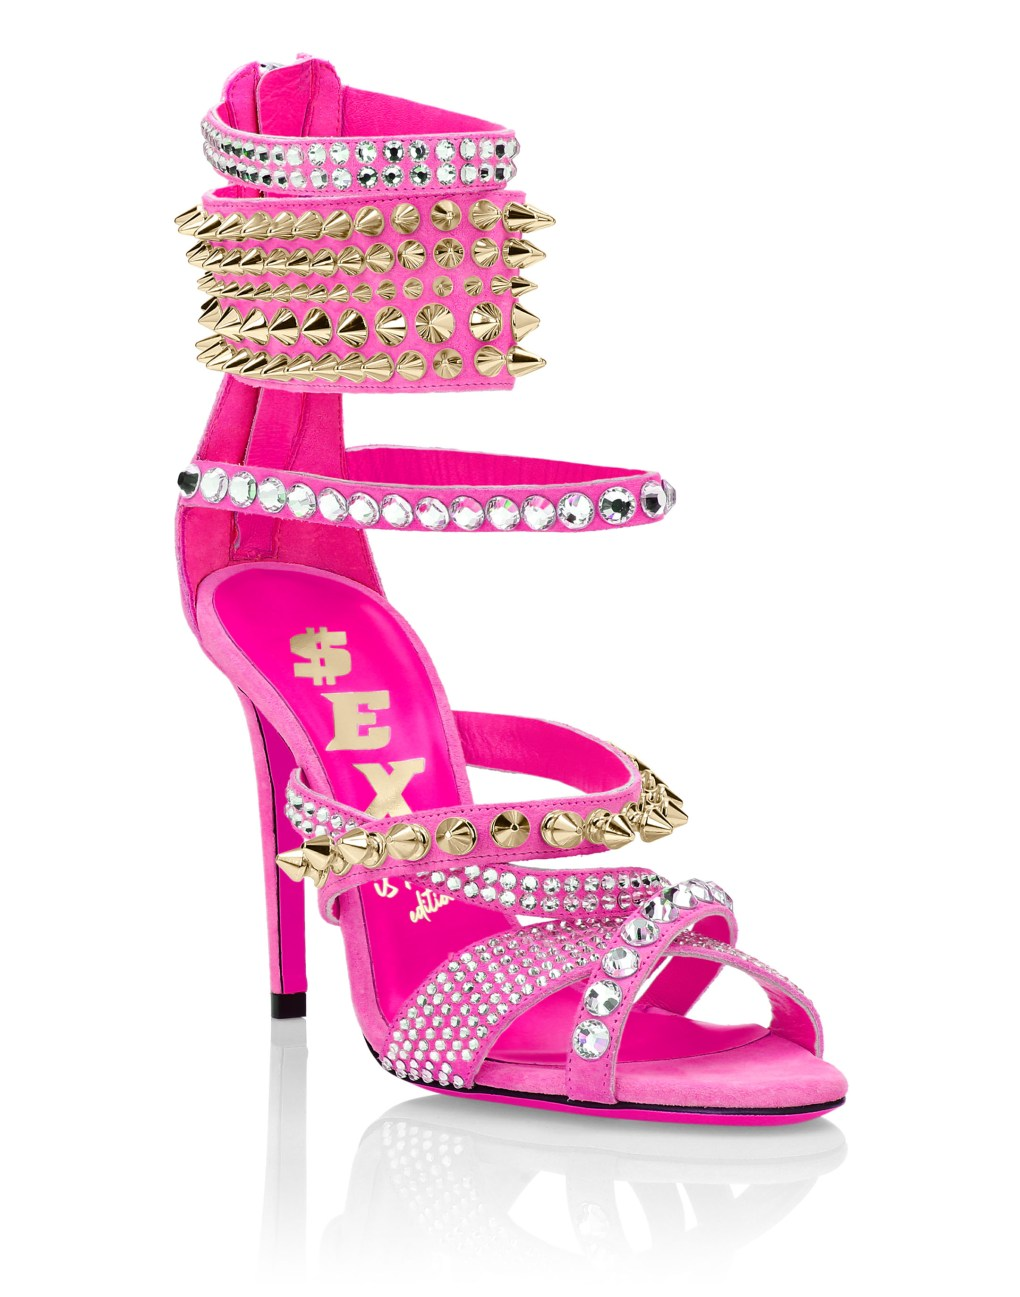 Phillipp Plein sexy pink sandal